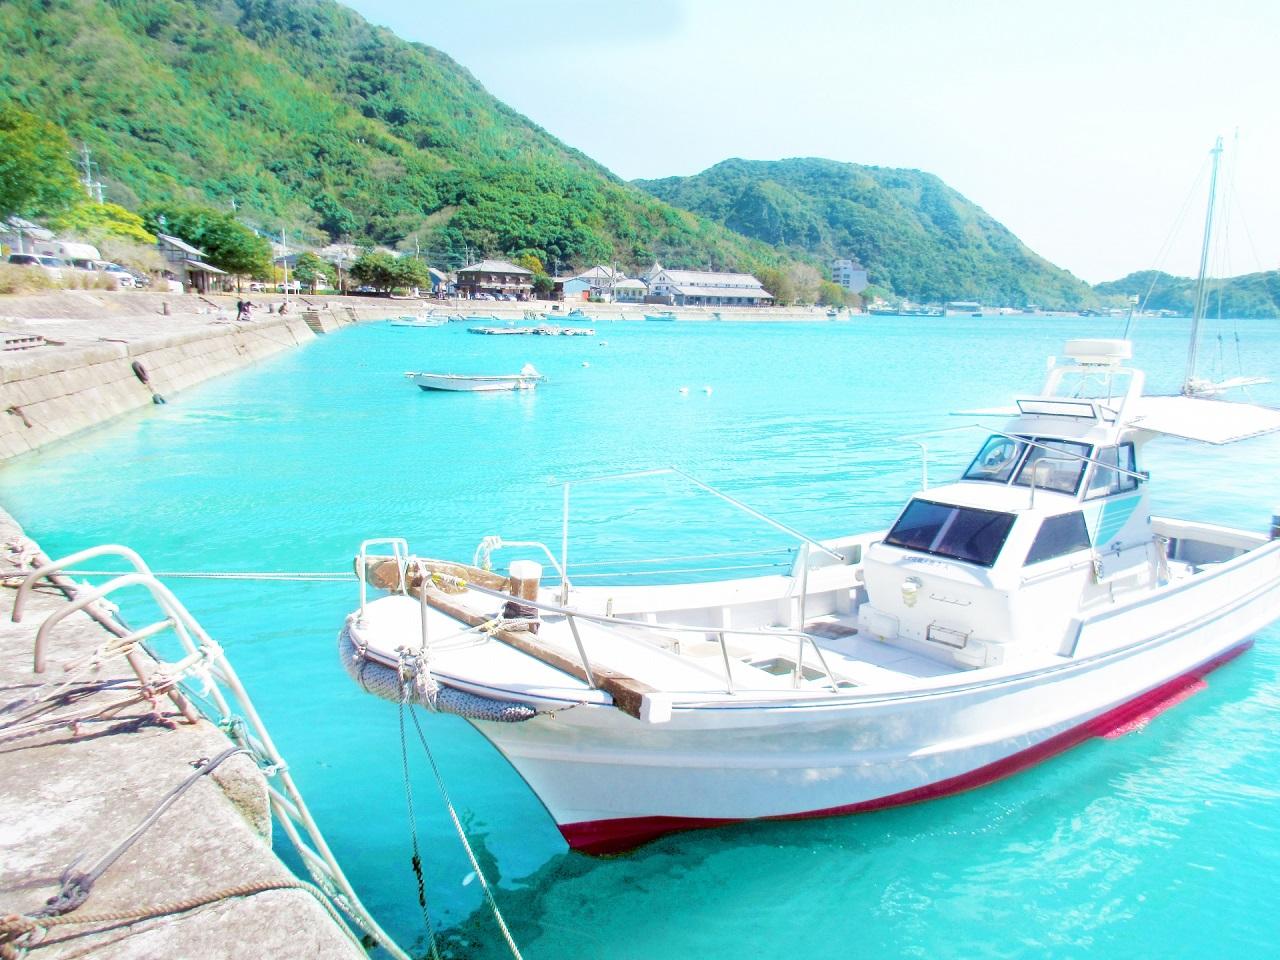 Amakusa Misumi Seaside Villa อยู่ใกล้กับใกล้ท่าเรือมิซุมิ (Misumi West Port)